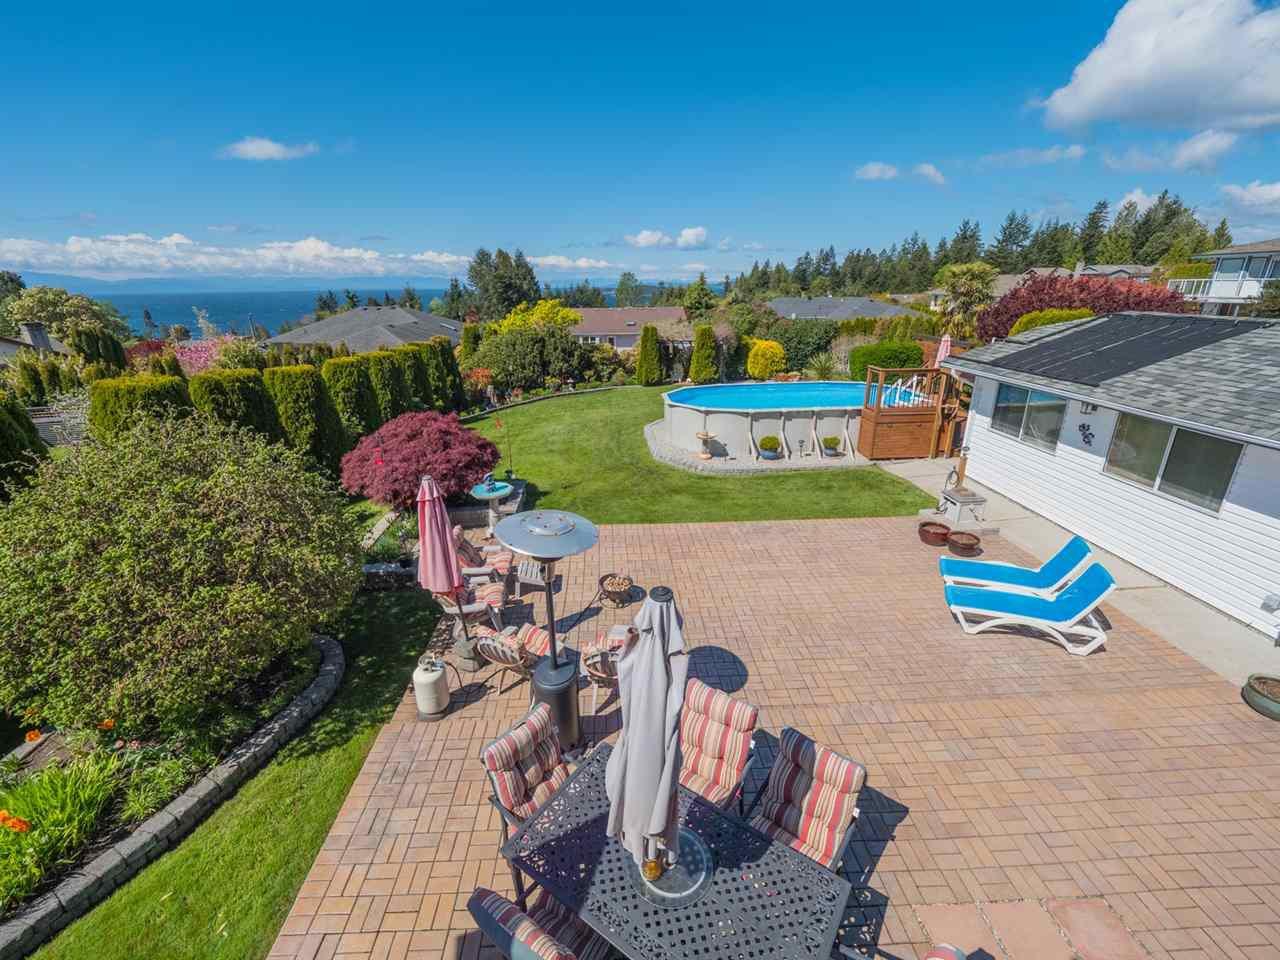 Photo 17: Photos: 4983 ARBUTUS Road in Sechelt: Sechelt District House for sale (Sunshine Coast)  : MLS®# R2427502